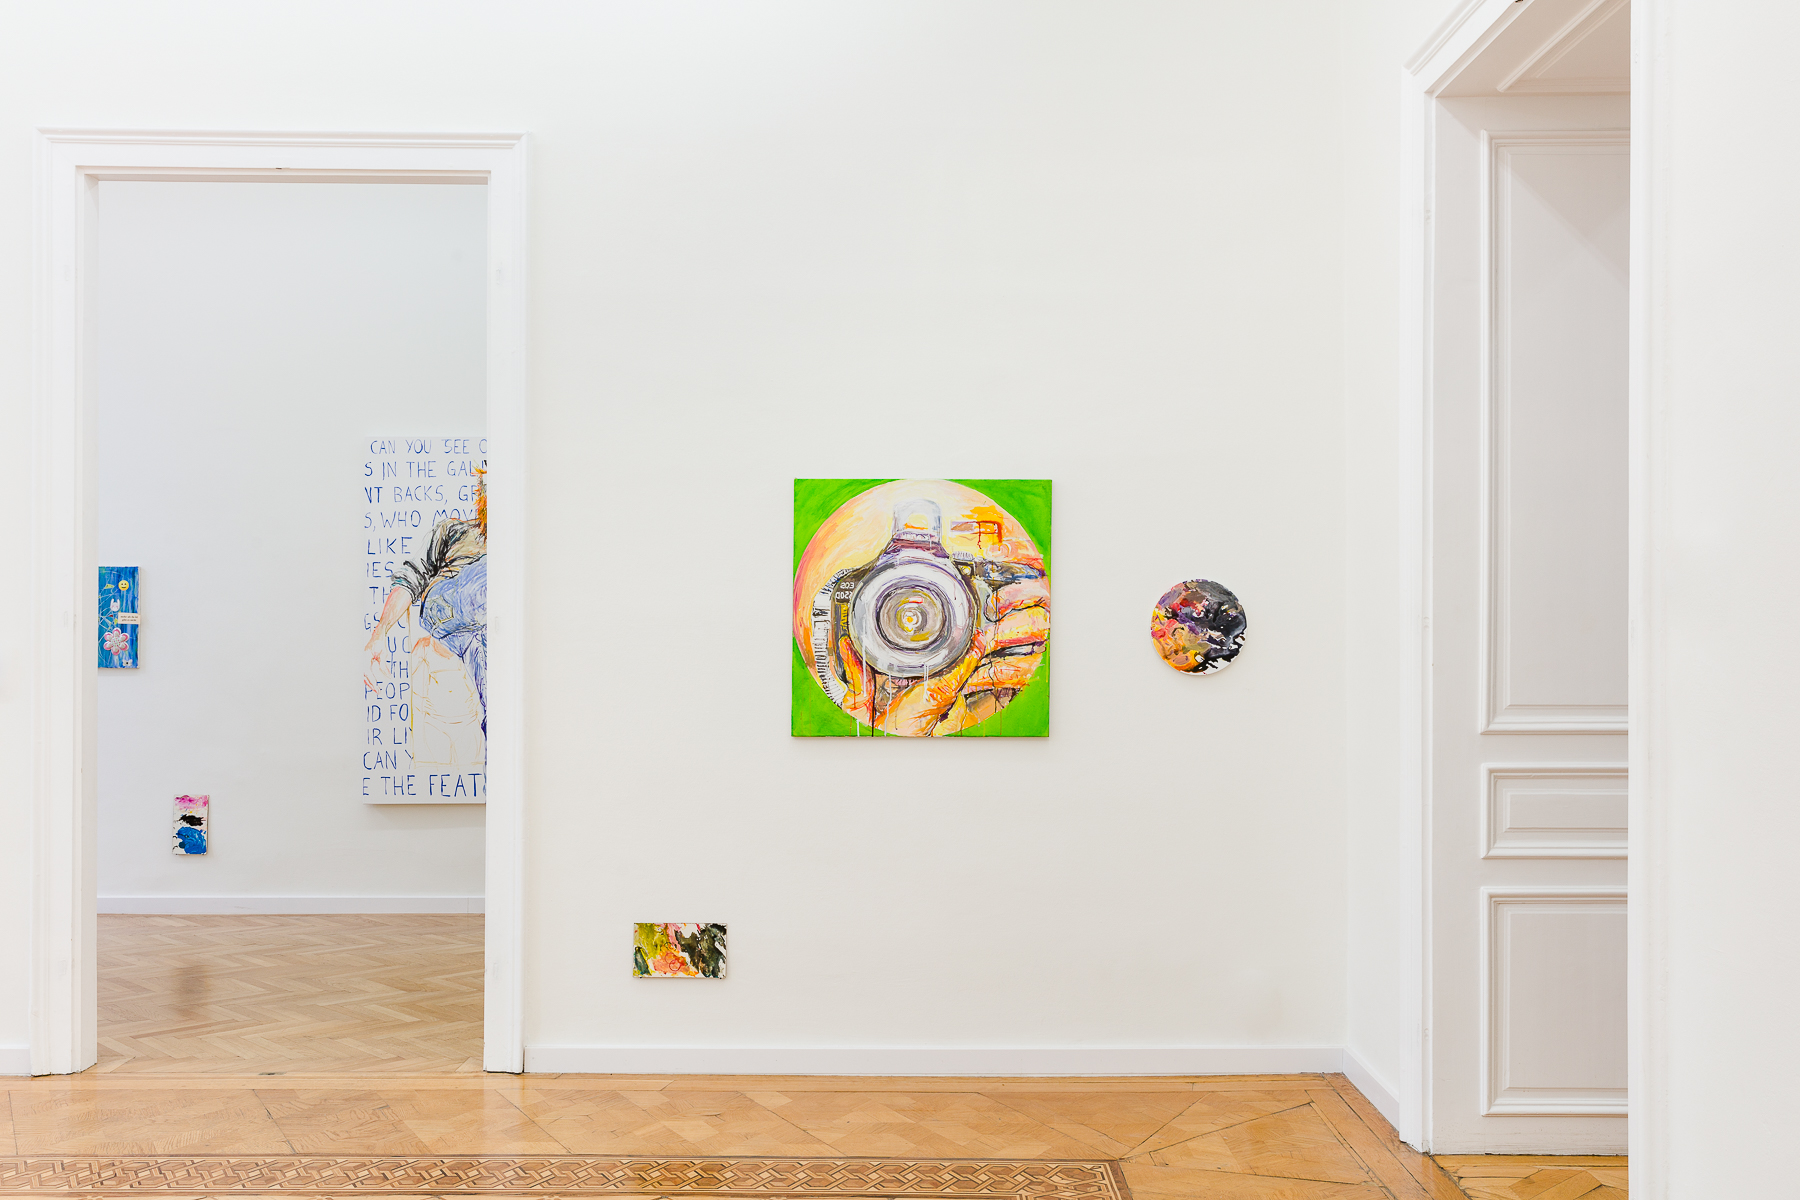 2019_05_20_Elke-Krystufek_Croy-Nielsen_by-kunst-dokumentation-com_053_web.jpg